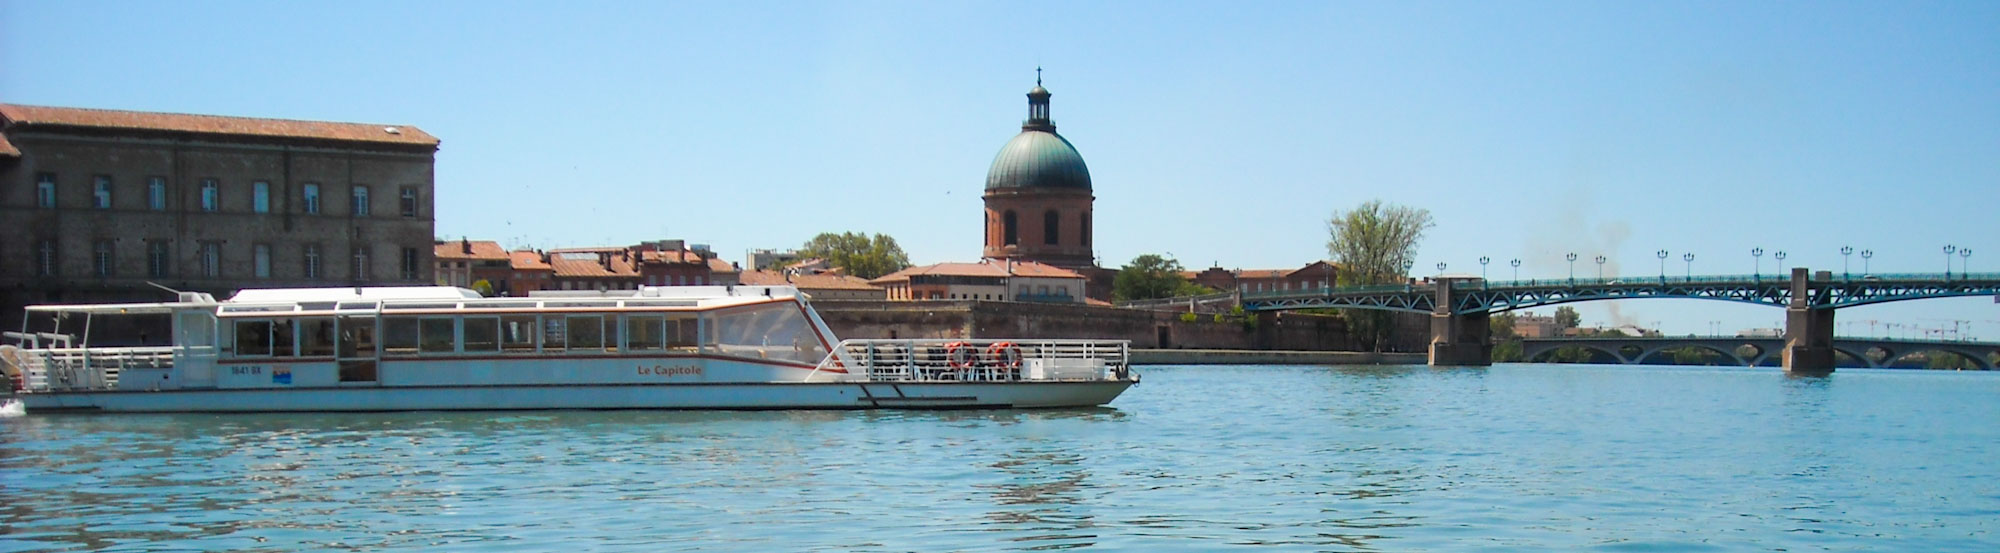 Blog for France - Toulouse en 3 jours